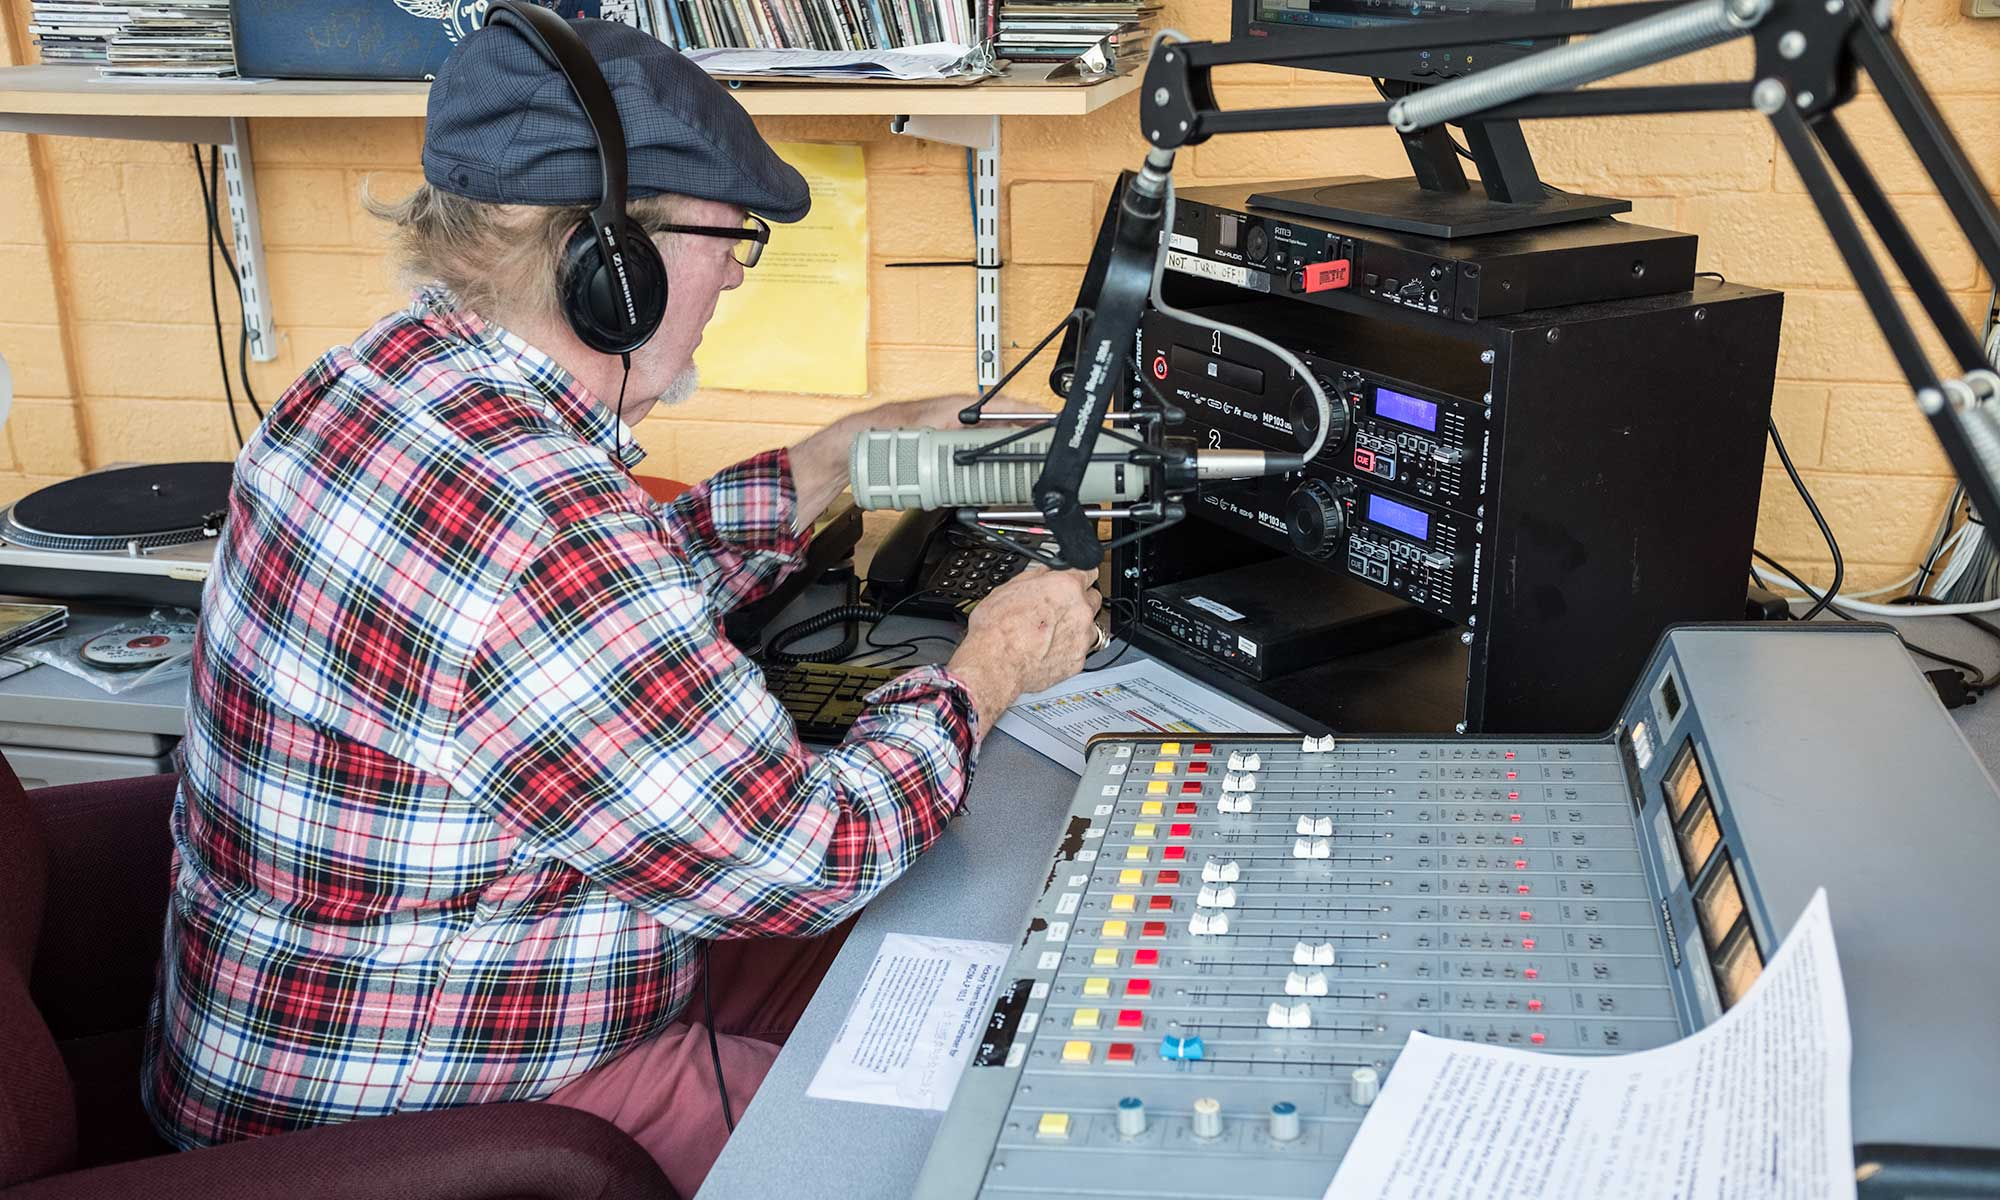 WCOM-LP | 103.5 FM